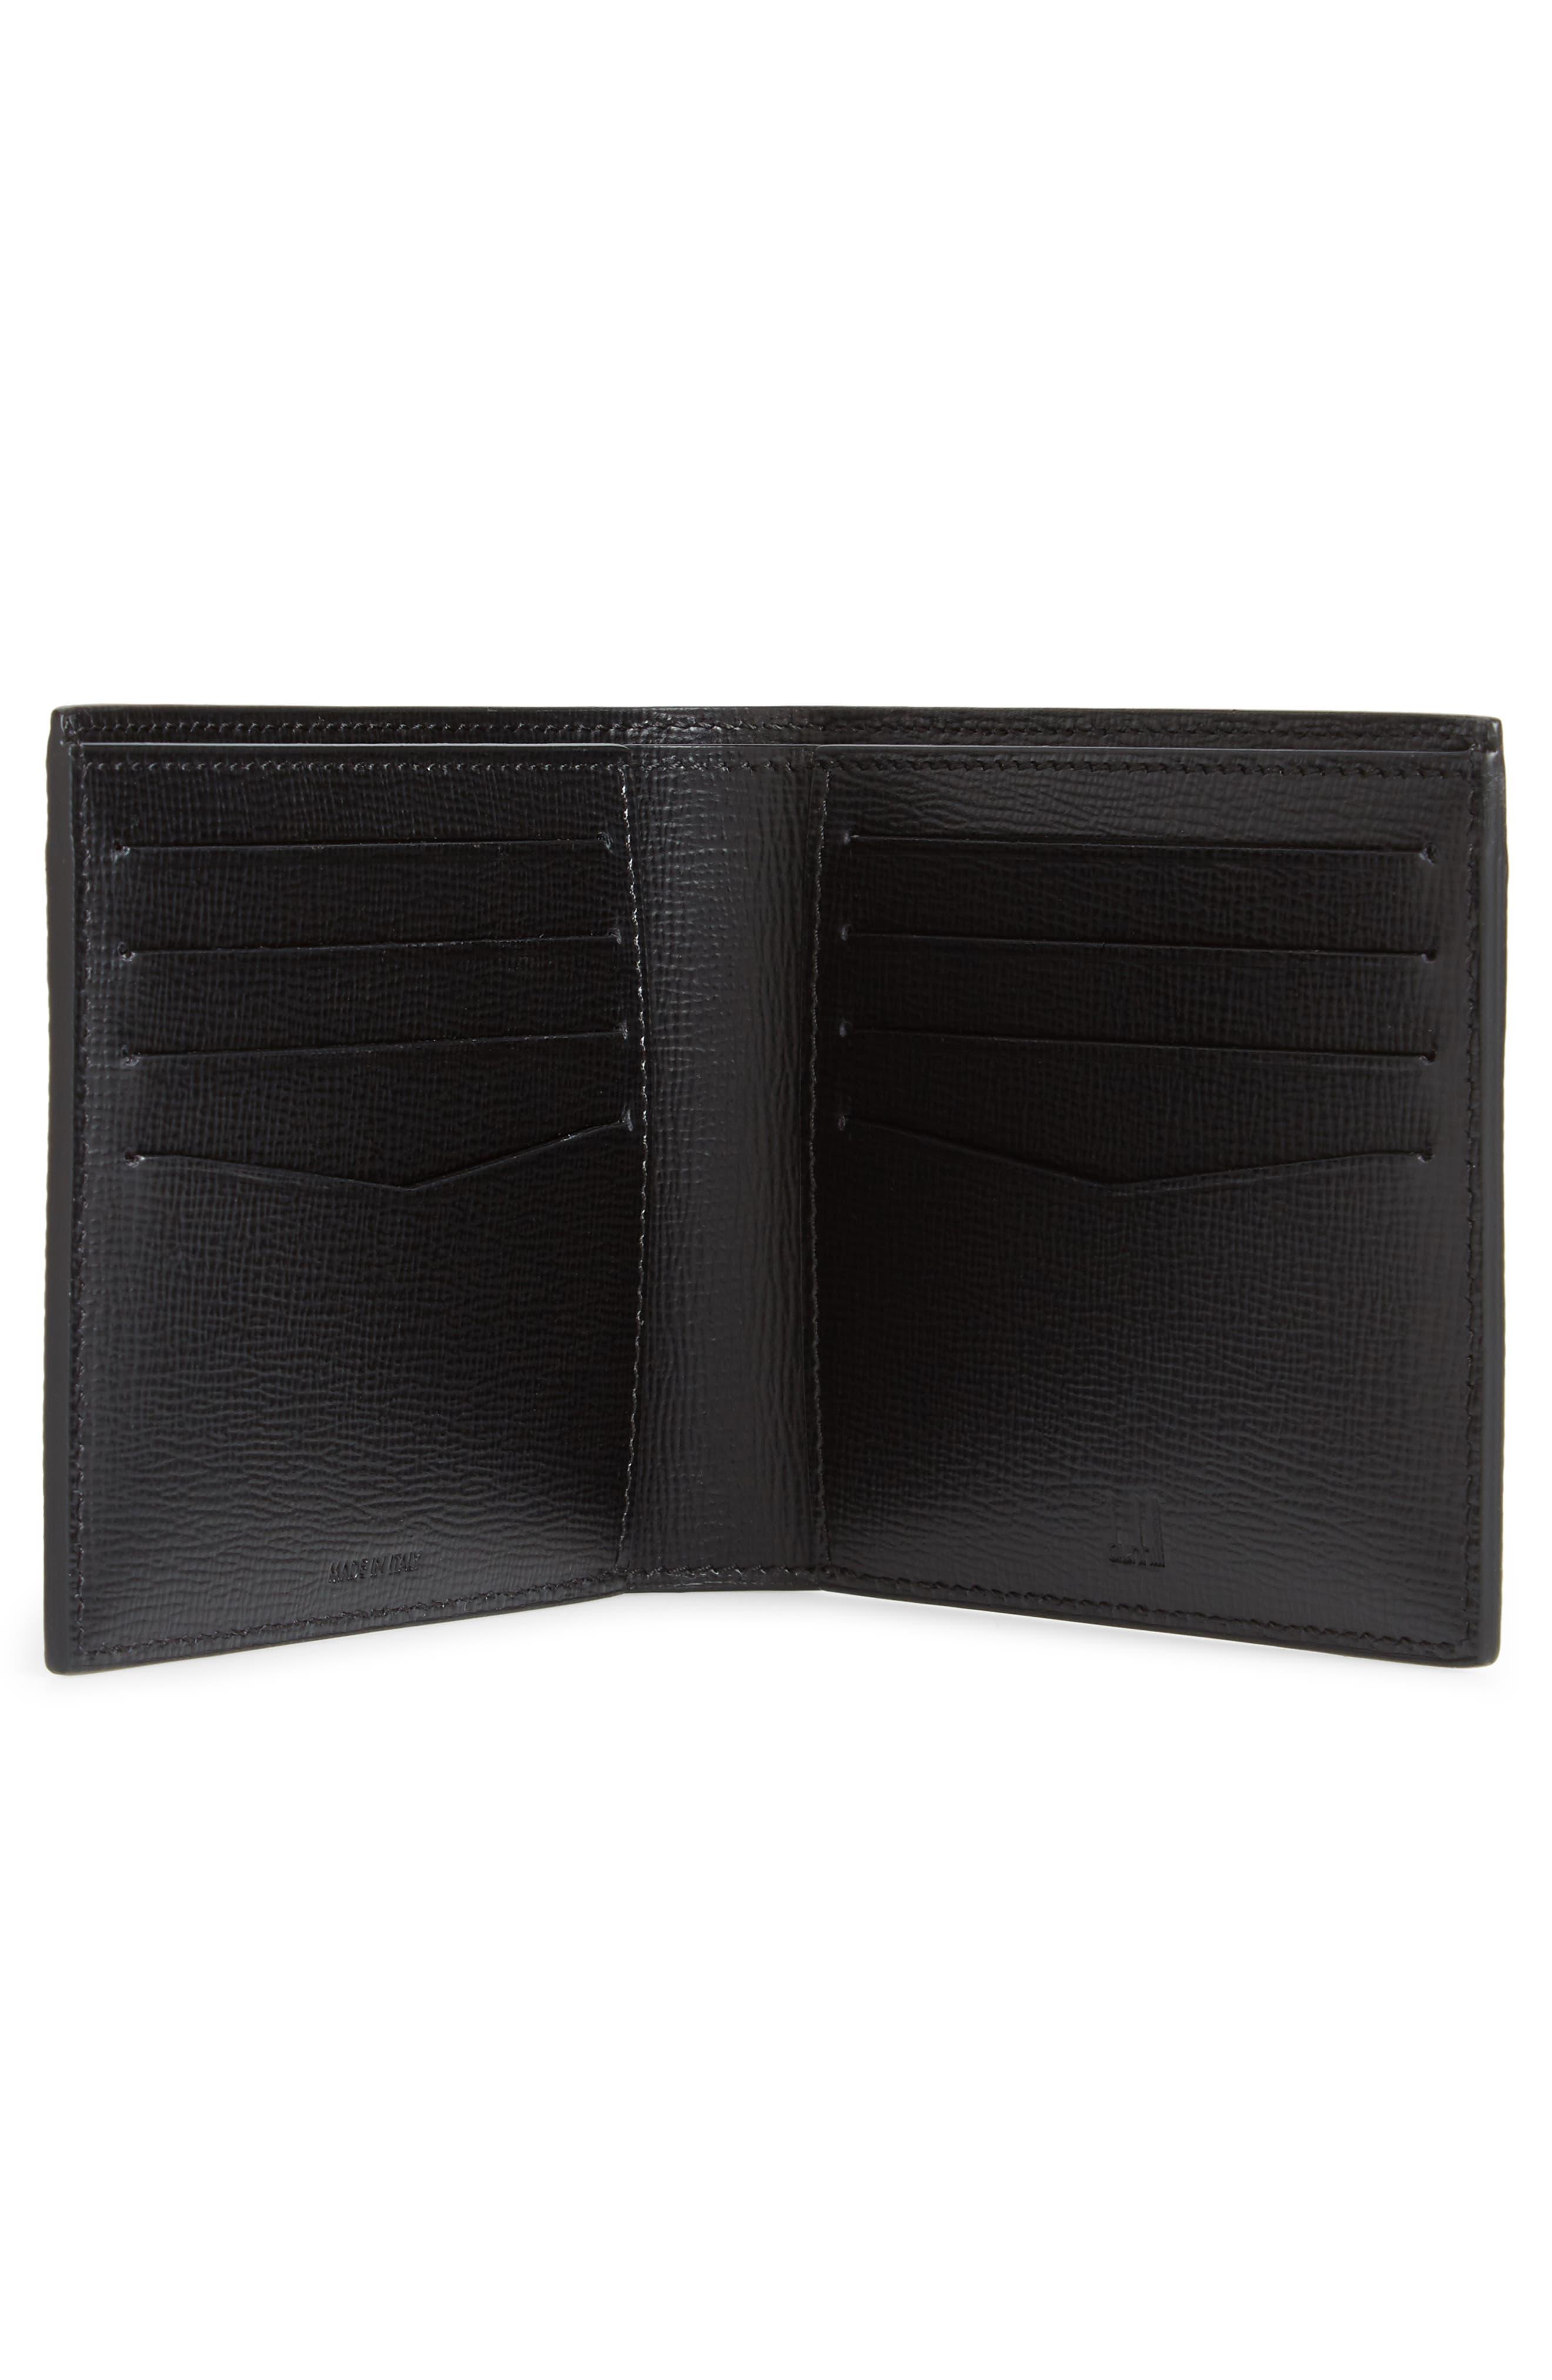 Cadogan Leather Wallet,                             Alternate thumbnail 2, color,                             020